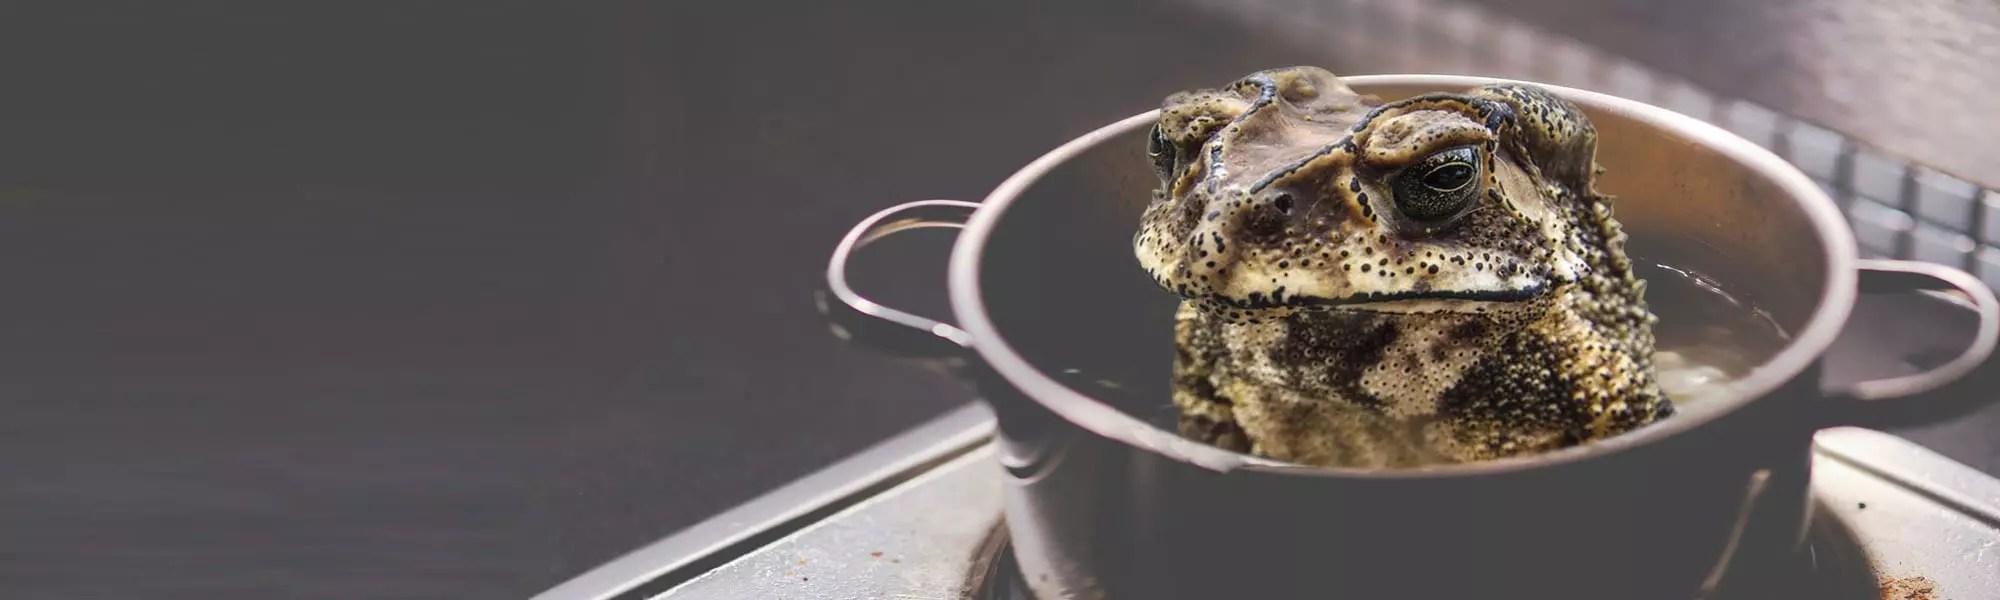 frog in pot recruitment banner